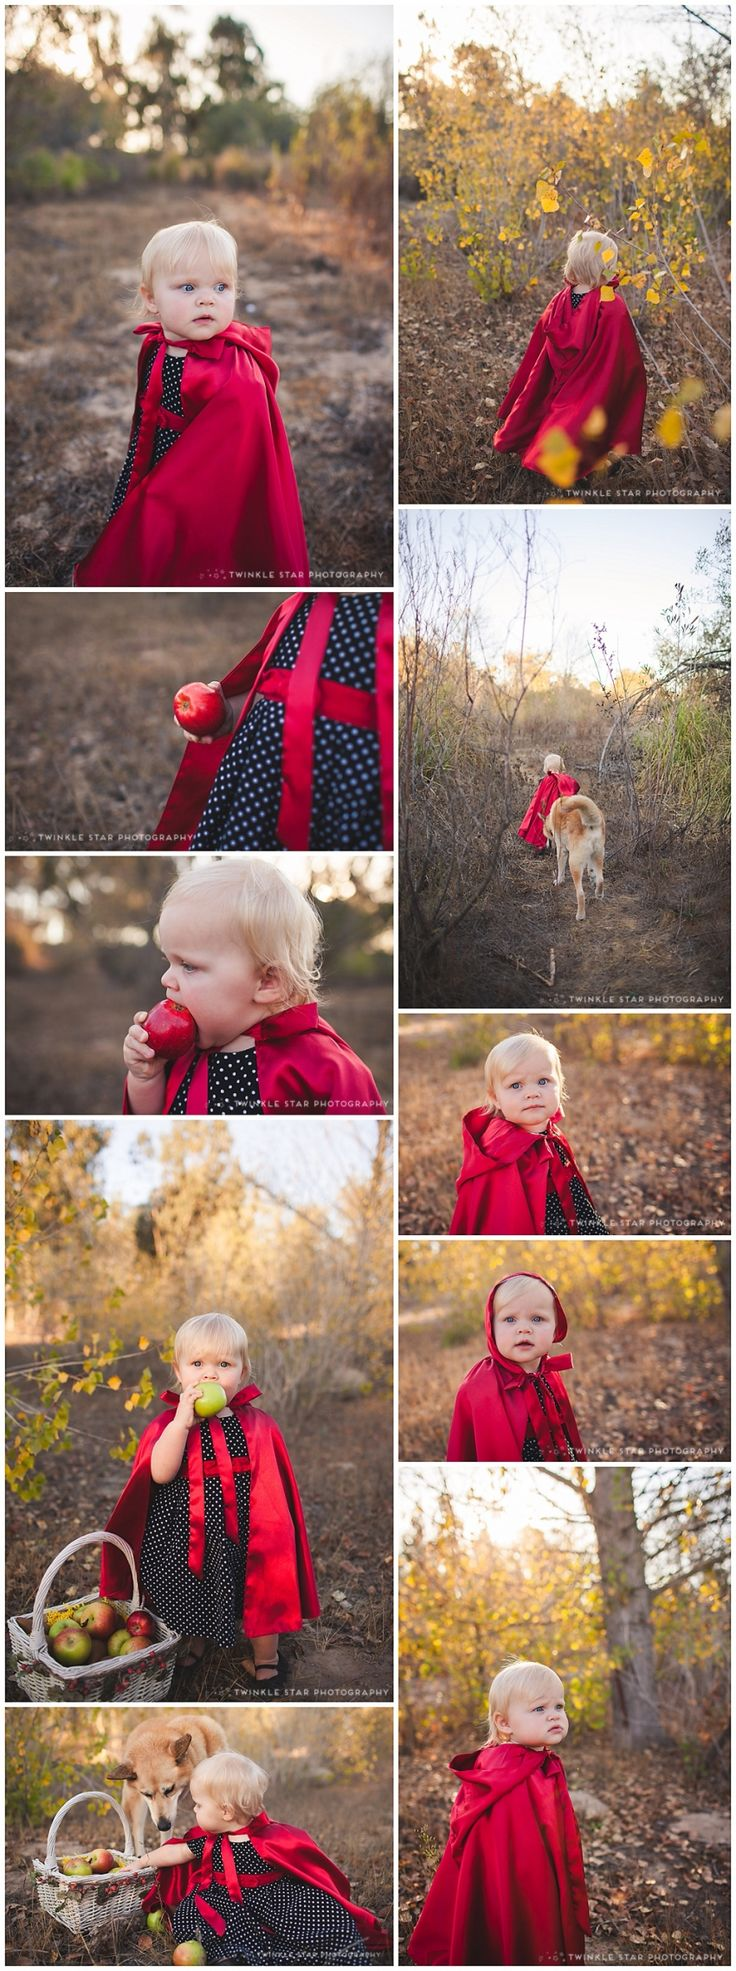 toddler photoshoot - little red riding hood. Santa Barbara Children's Photography {Halloween} - 1 year old photo ideas